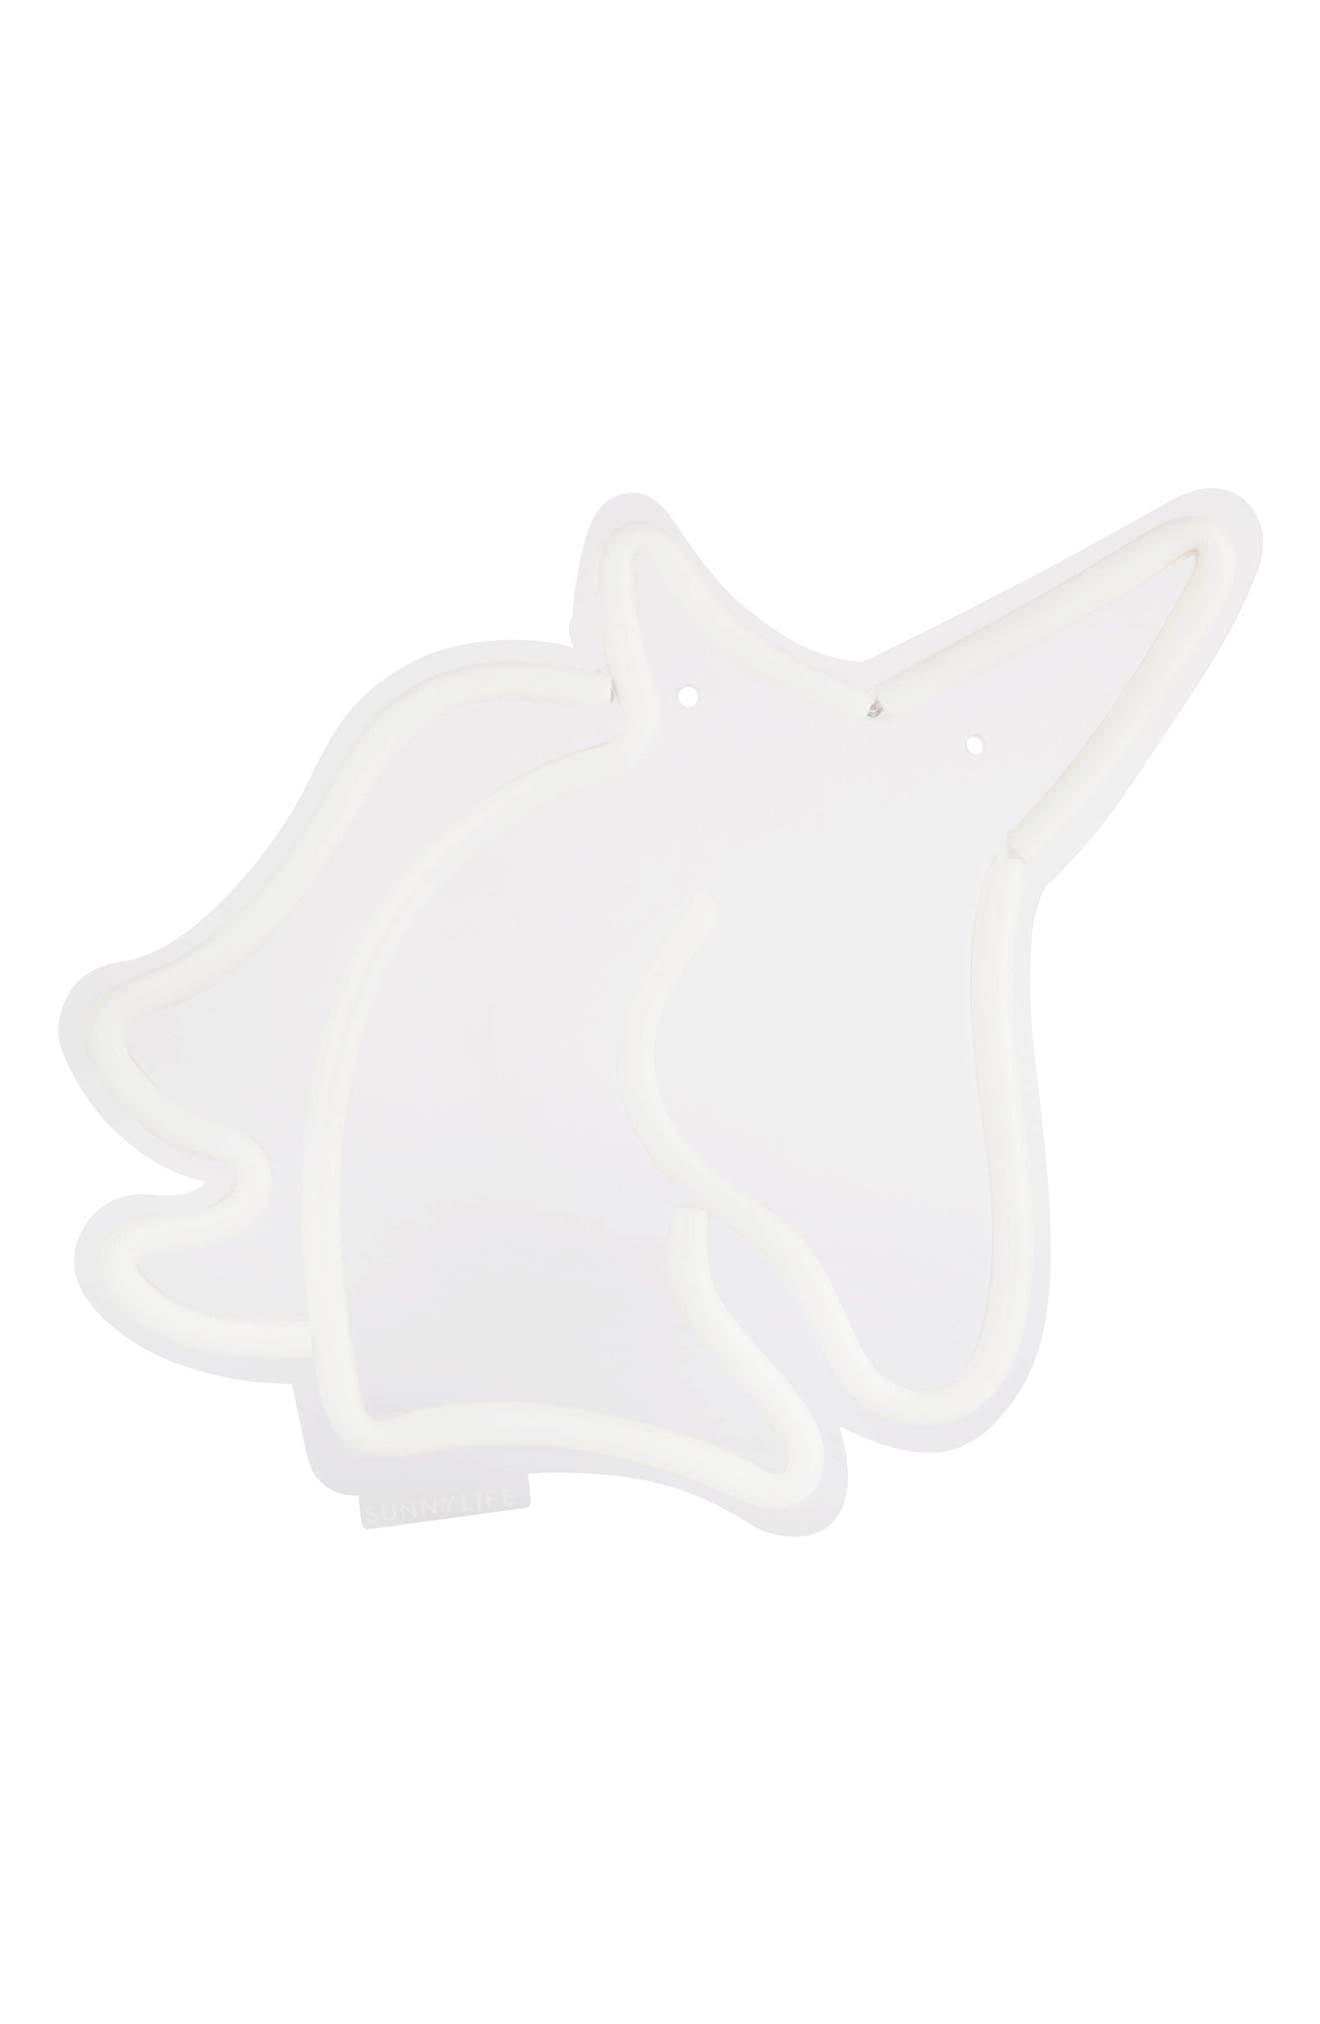 Alternate Image 3  - Sunnylife Small Unicorn Neon LED Wall Light (Girls)